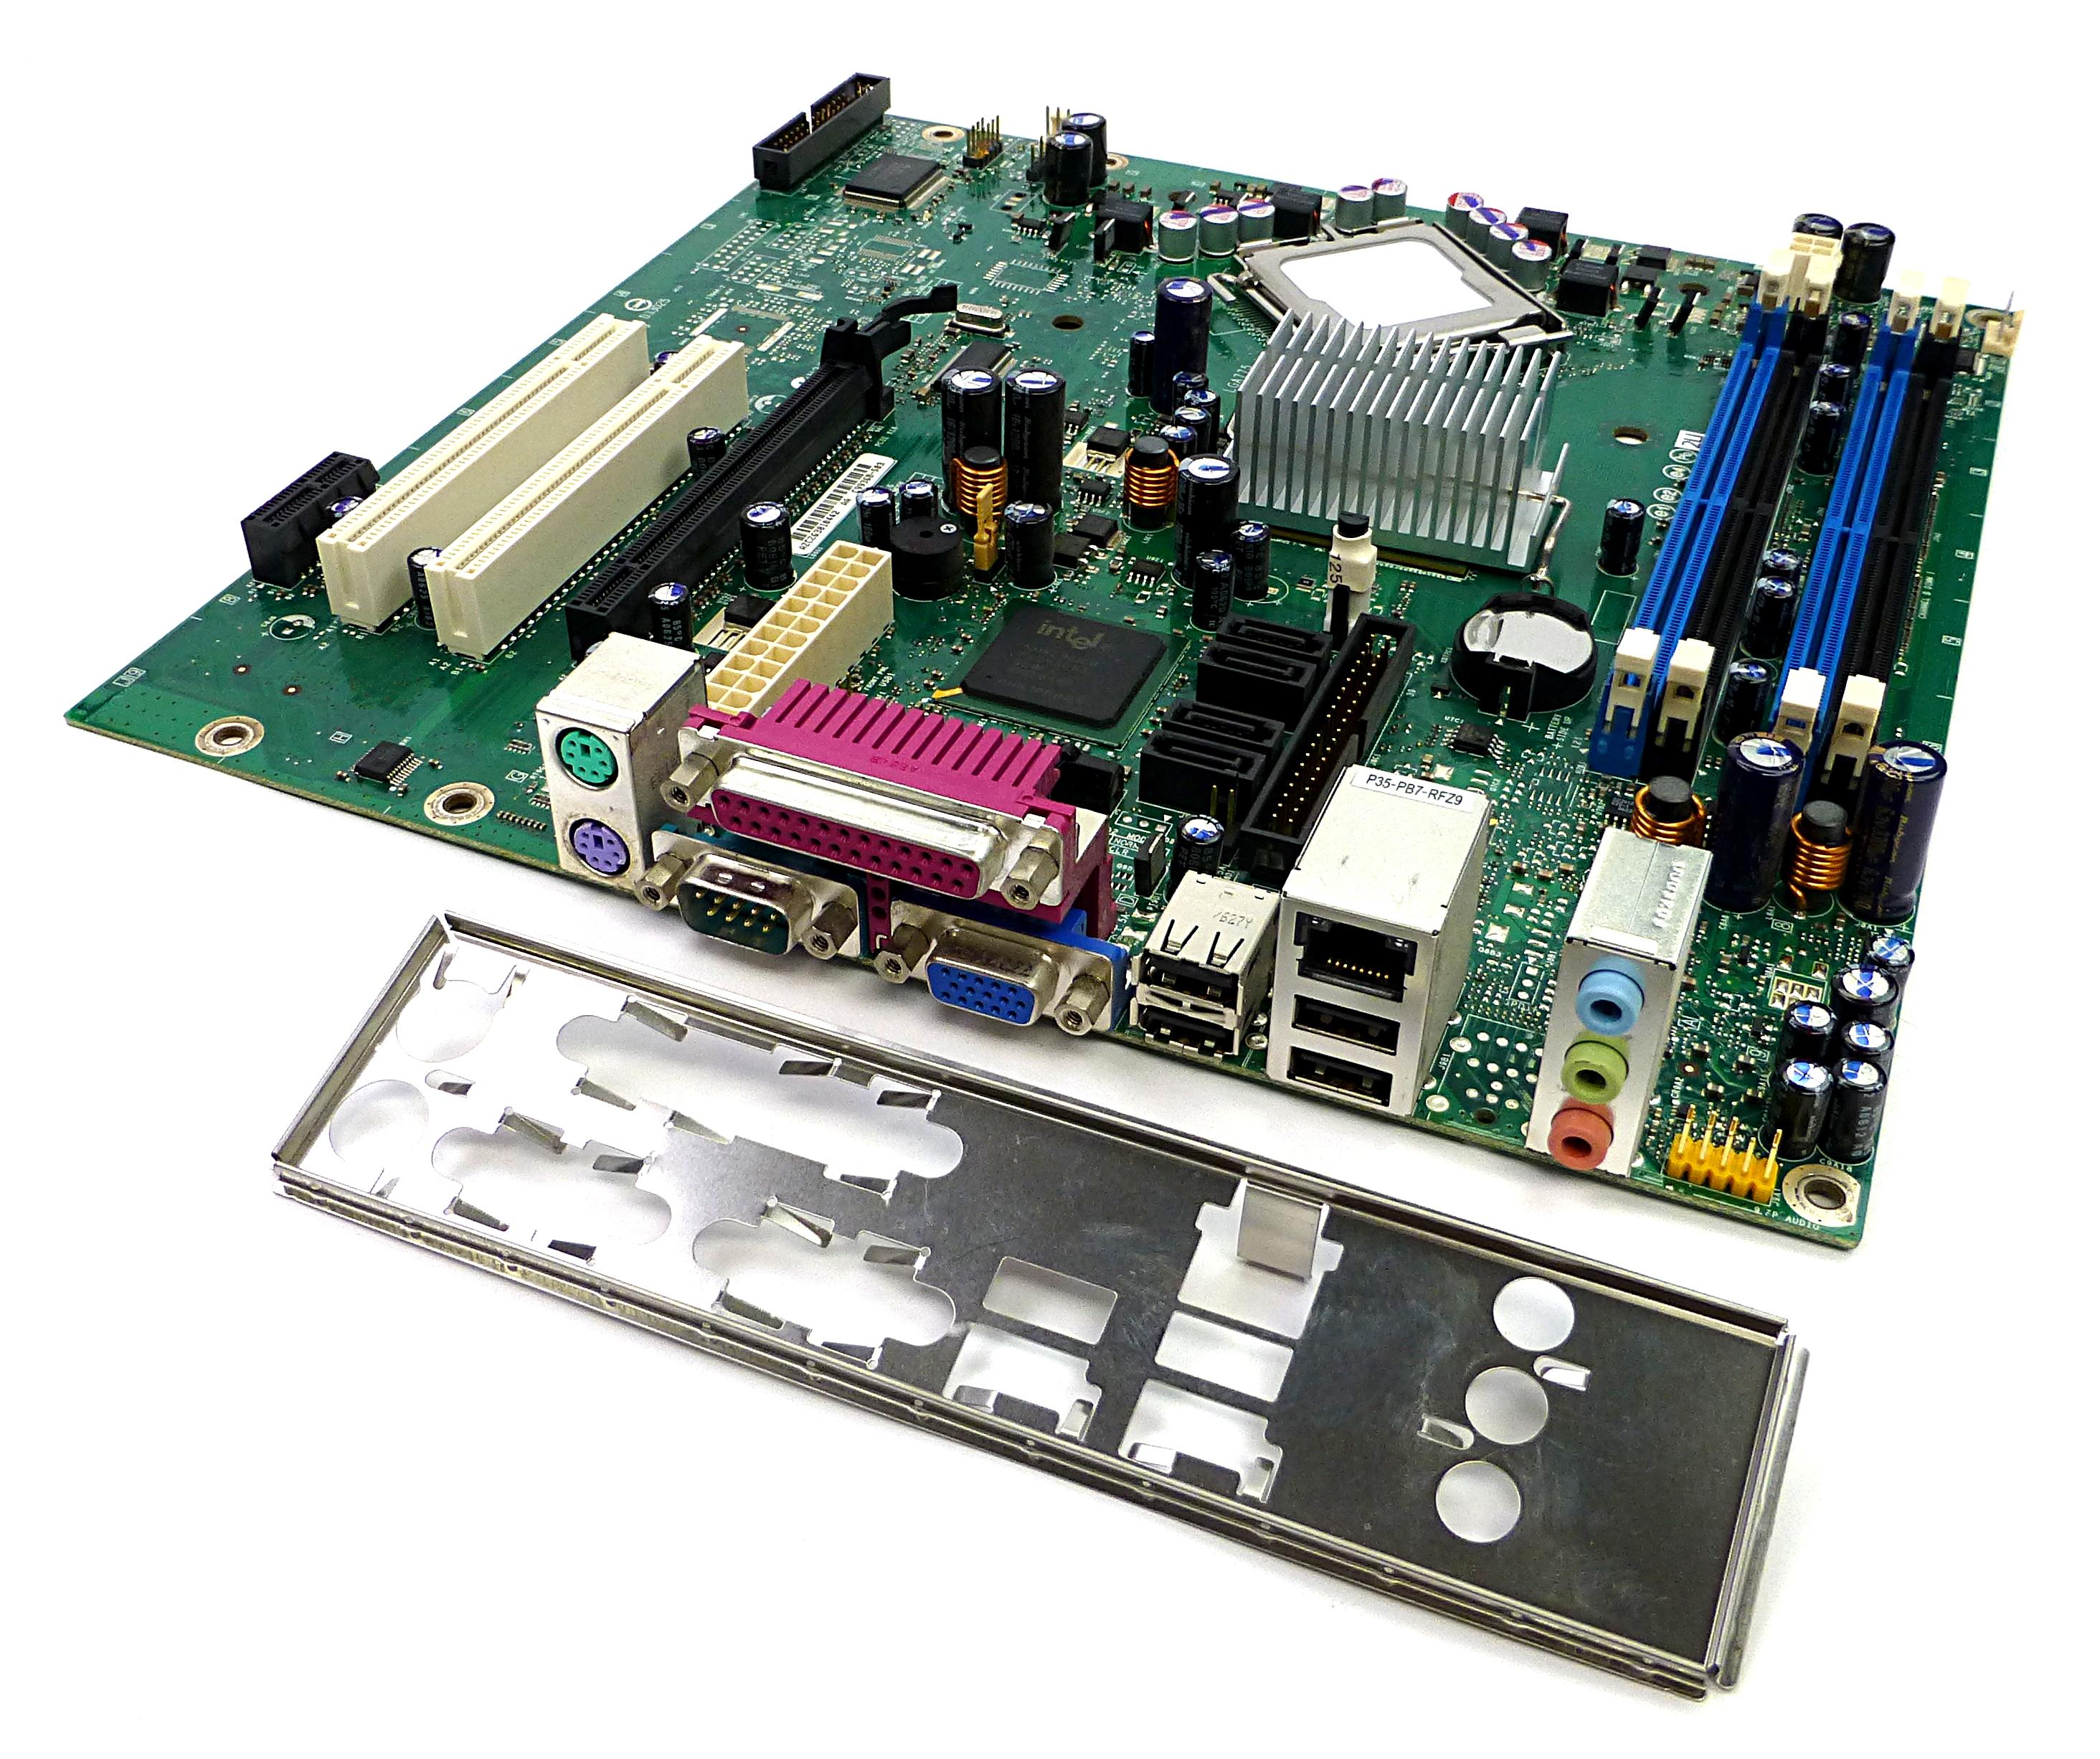 Intel C99368-503 D945GCZ LGA775 System Motherboard